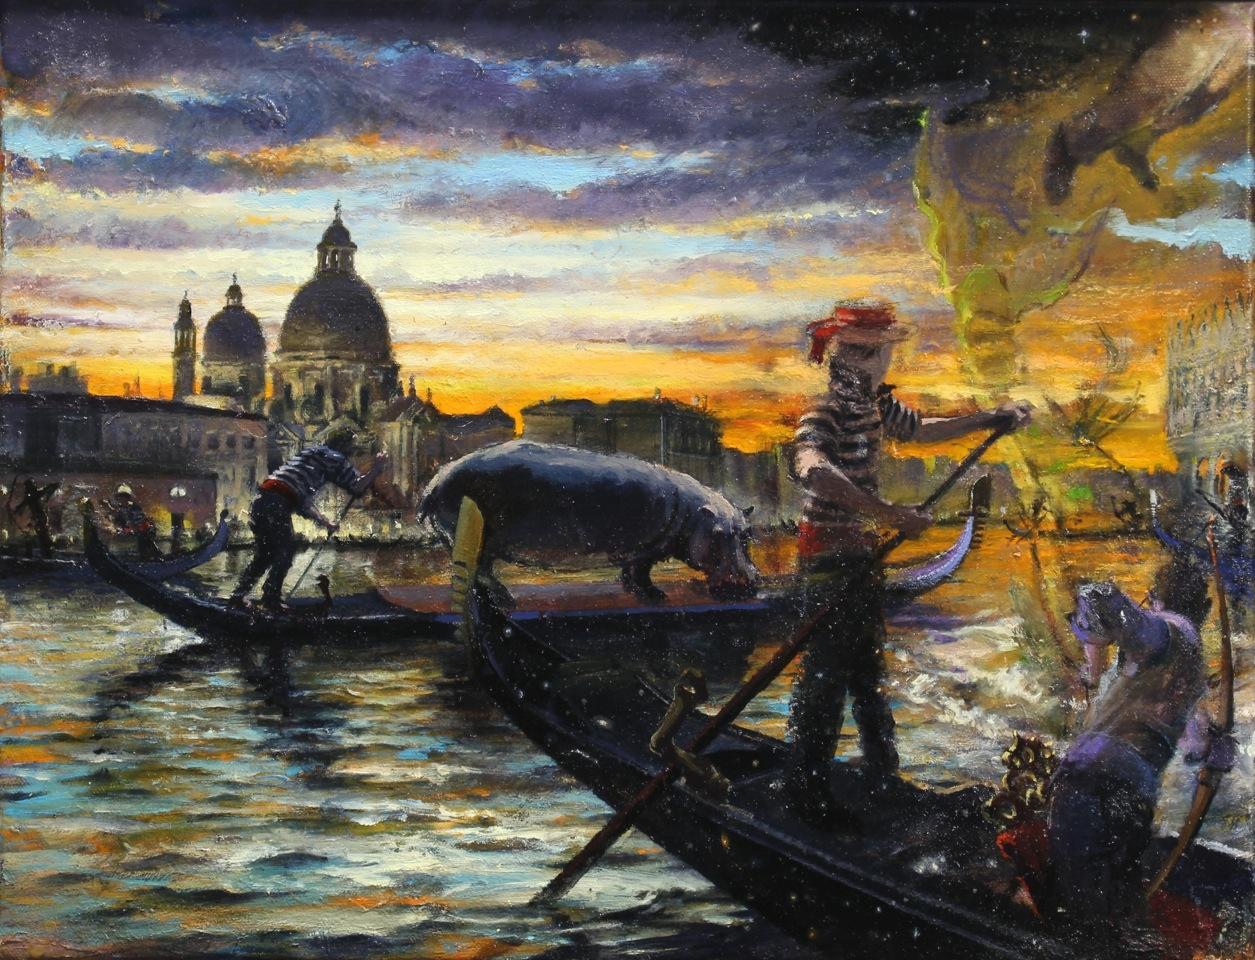 Lagoon Fantasia, 2015 oil on canvas, 14 x 18 inches